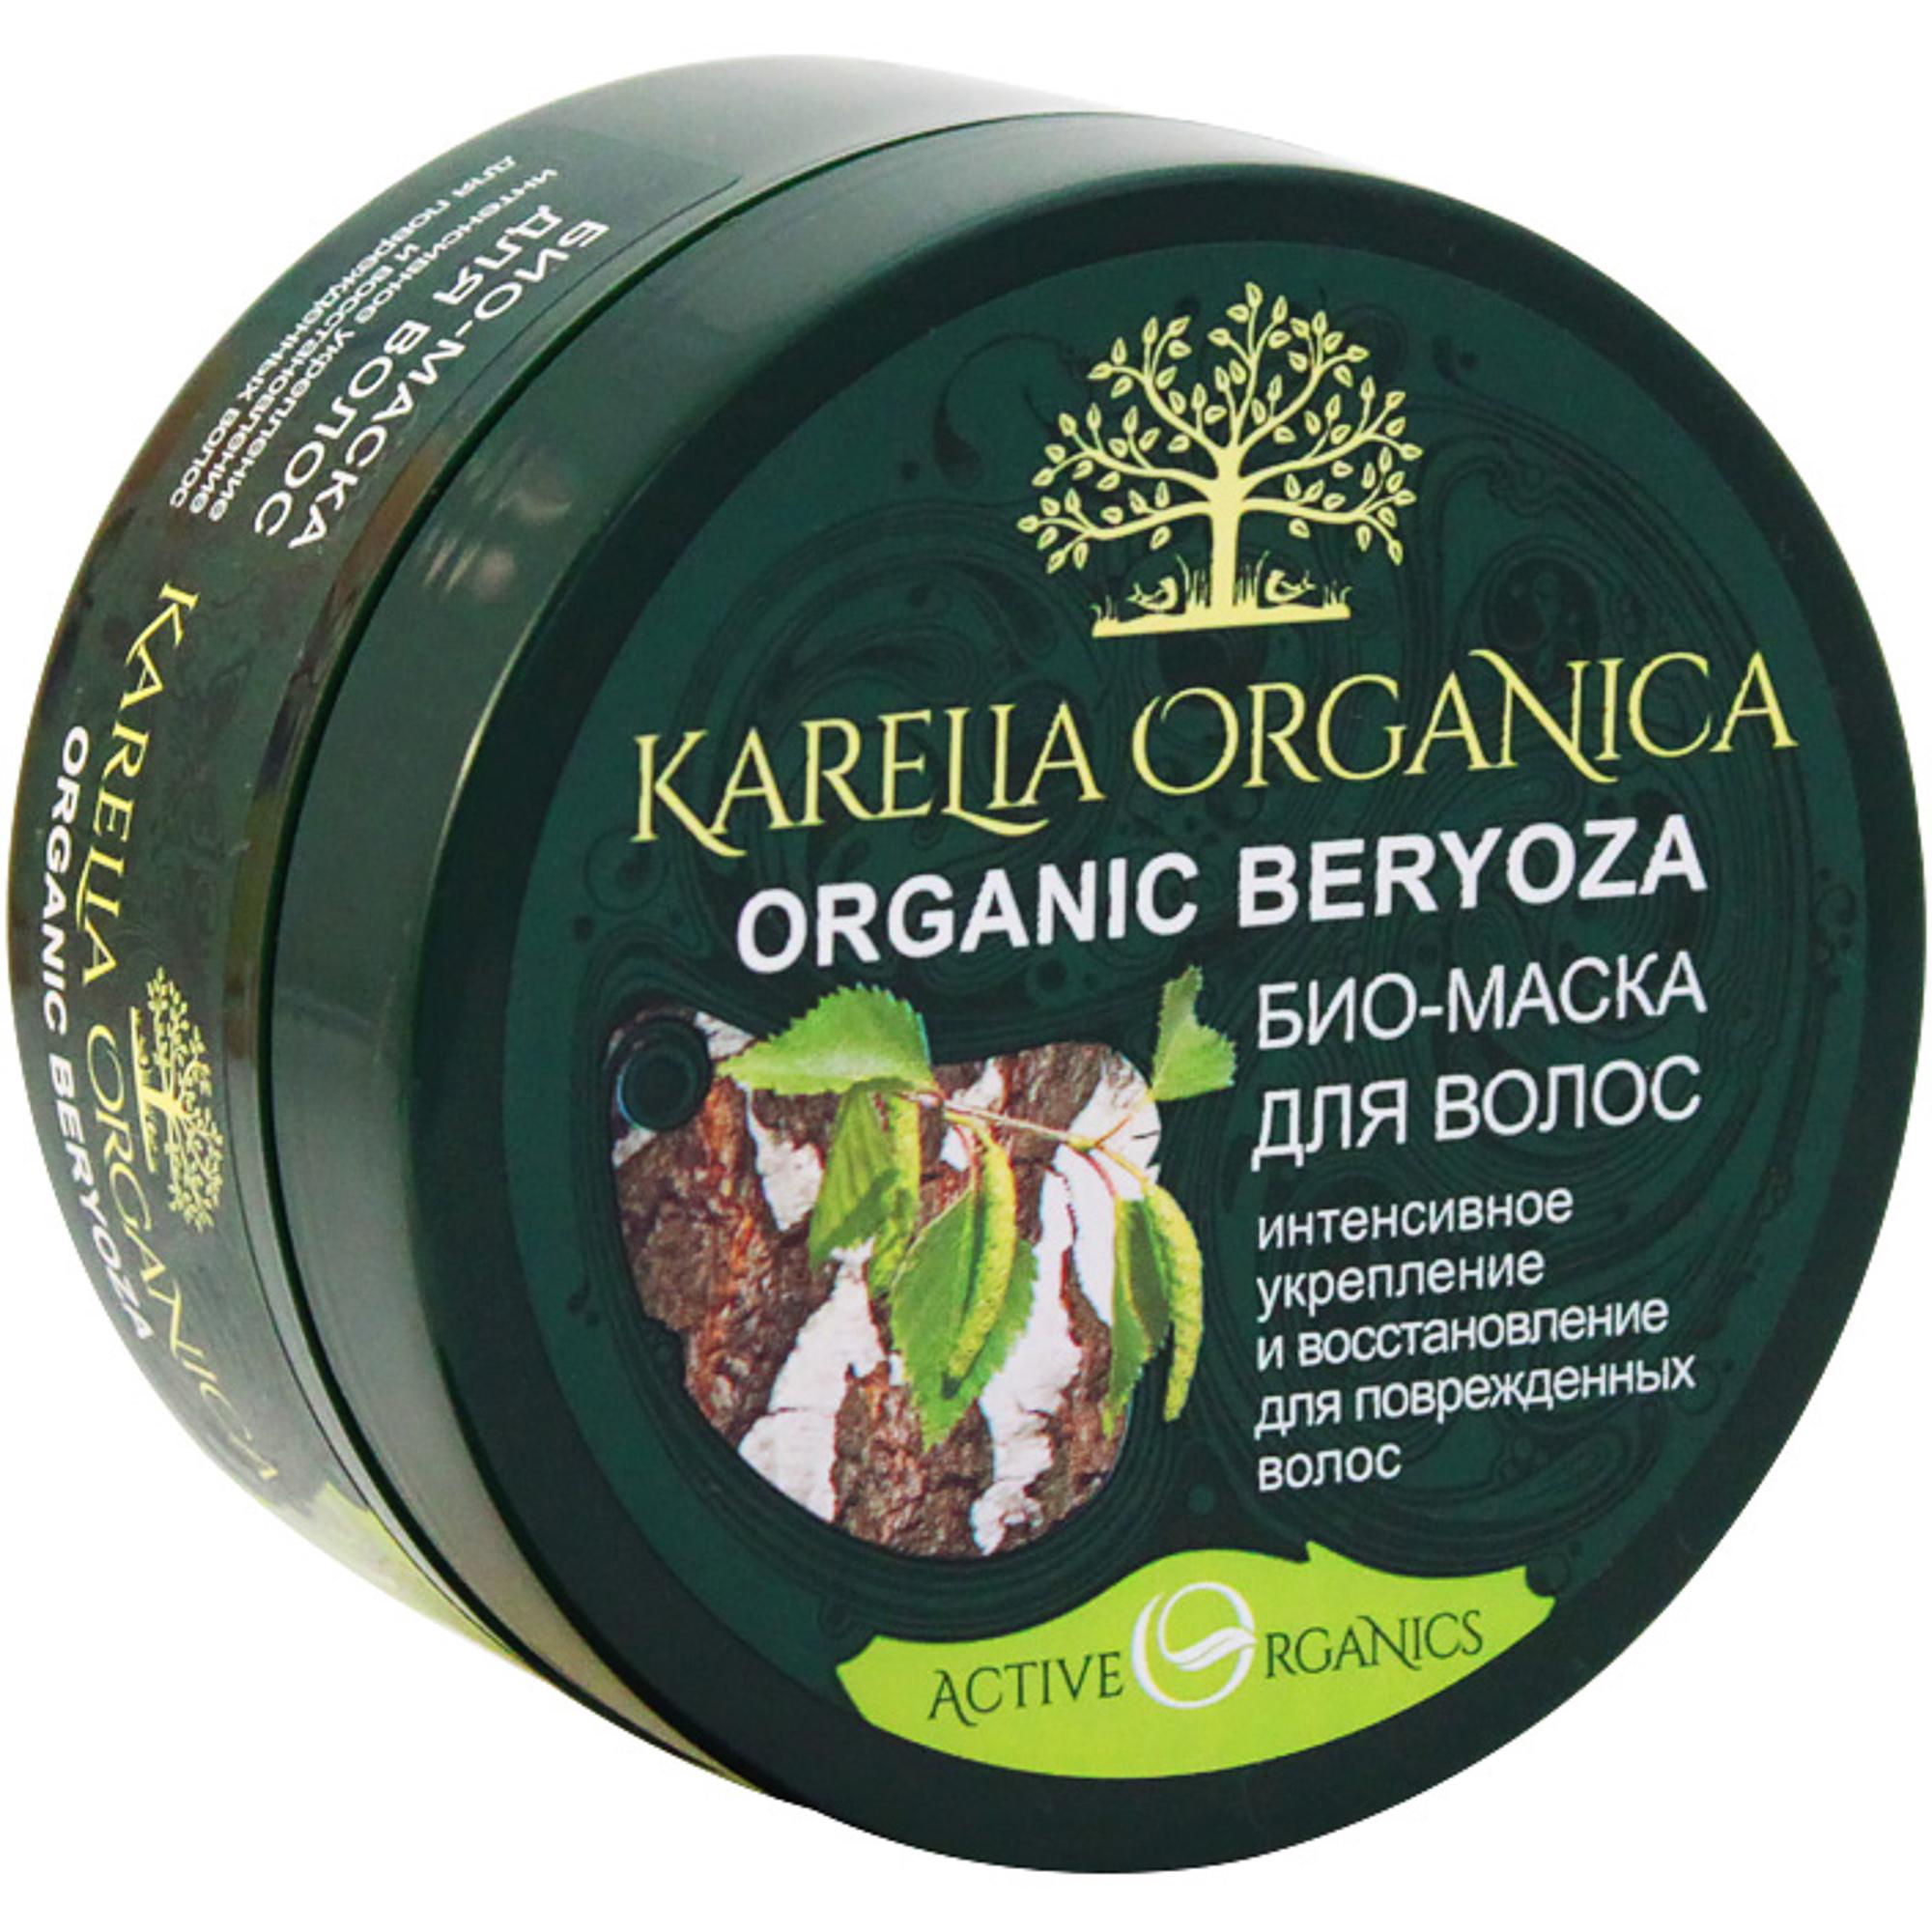 Био-маска Фратти НВ Karelia Organica Organic Beryoza 220 мл фото